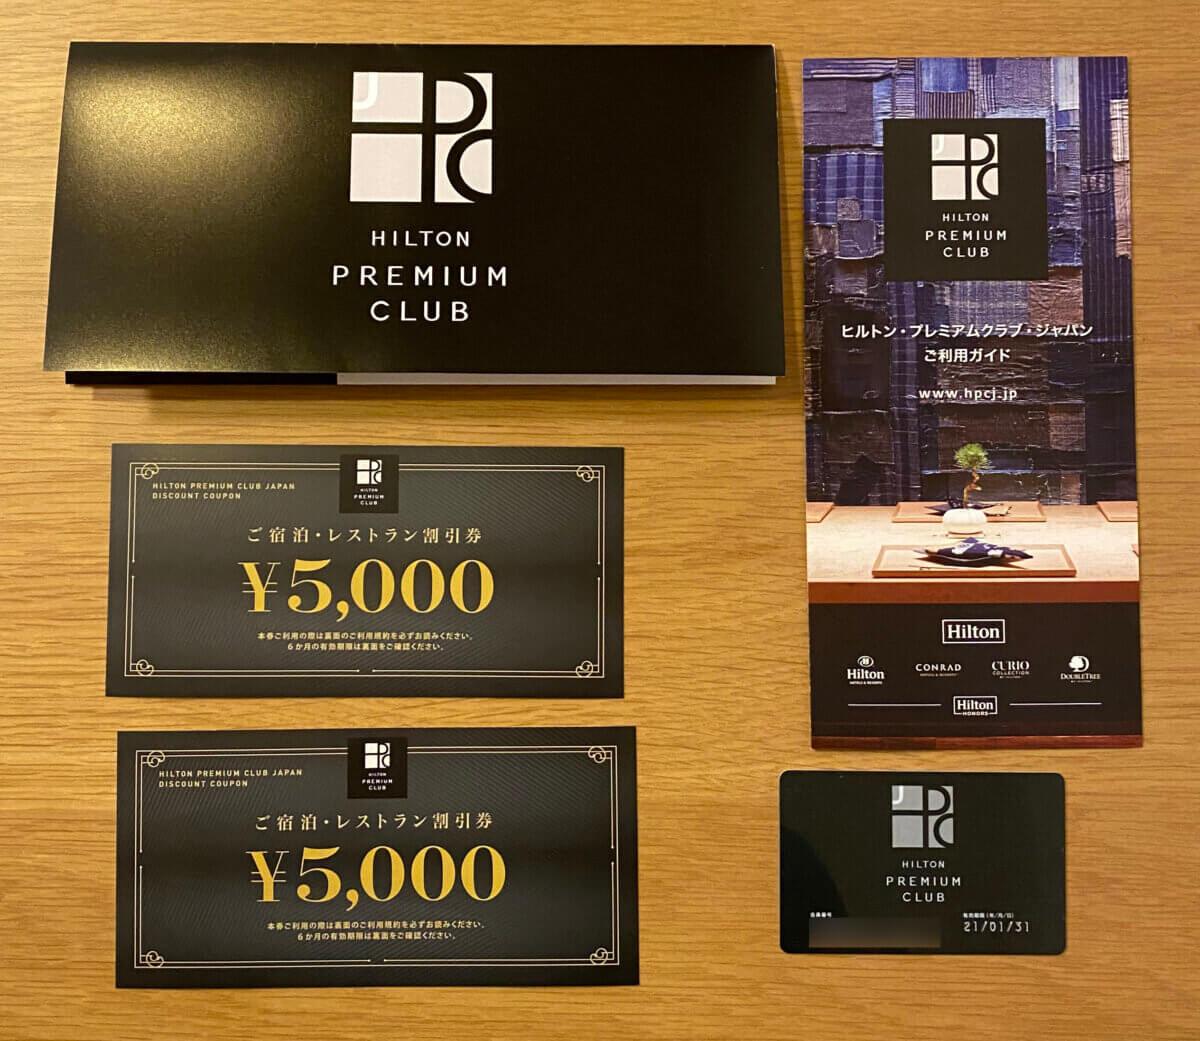 HPCJのガイド・会員証・1万円分の優待券